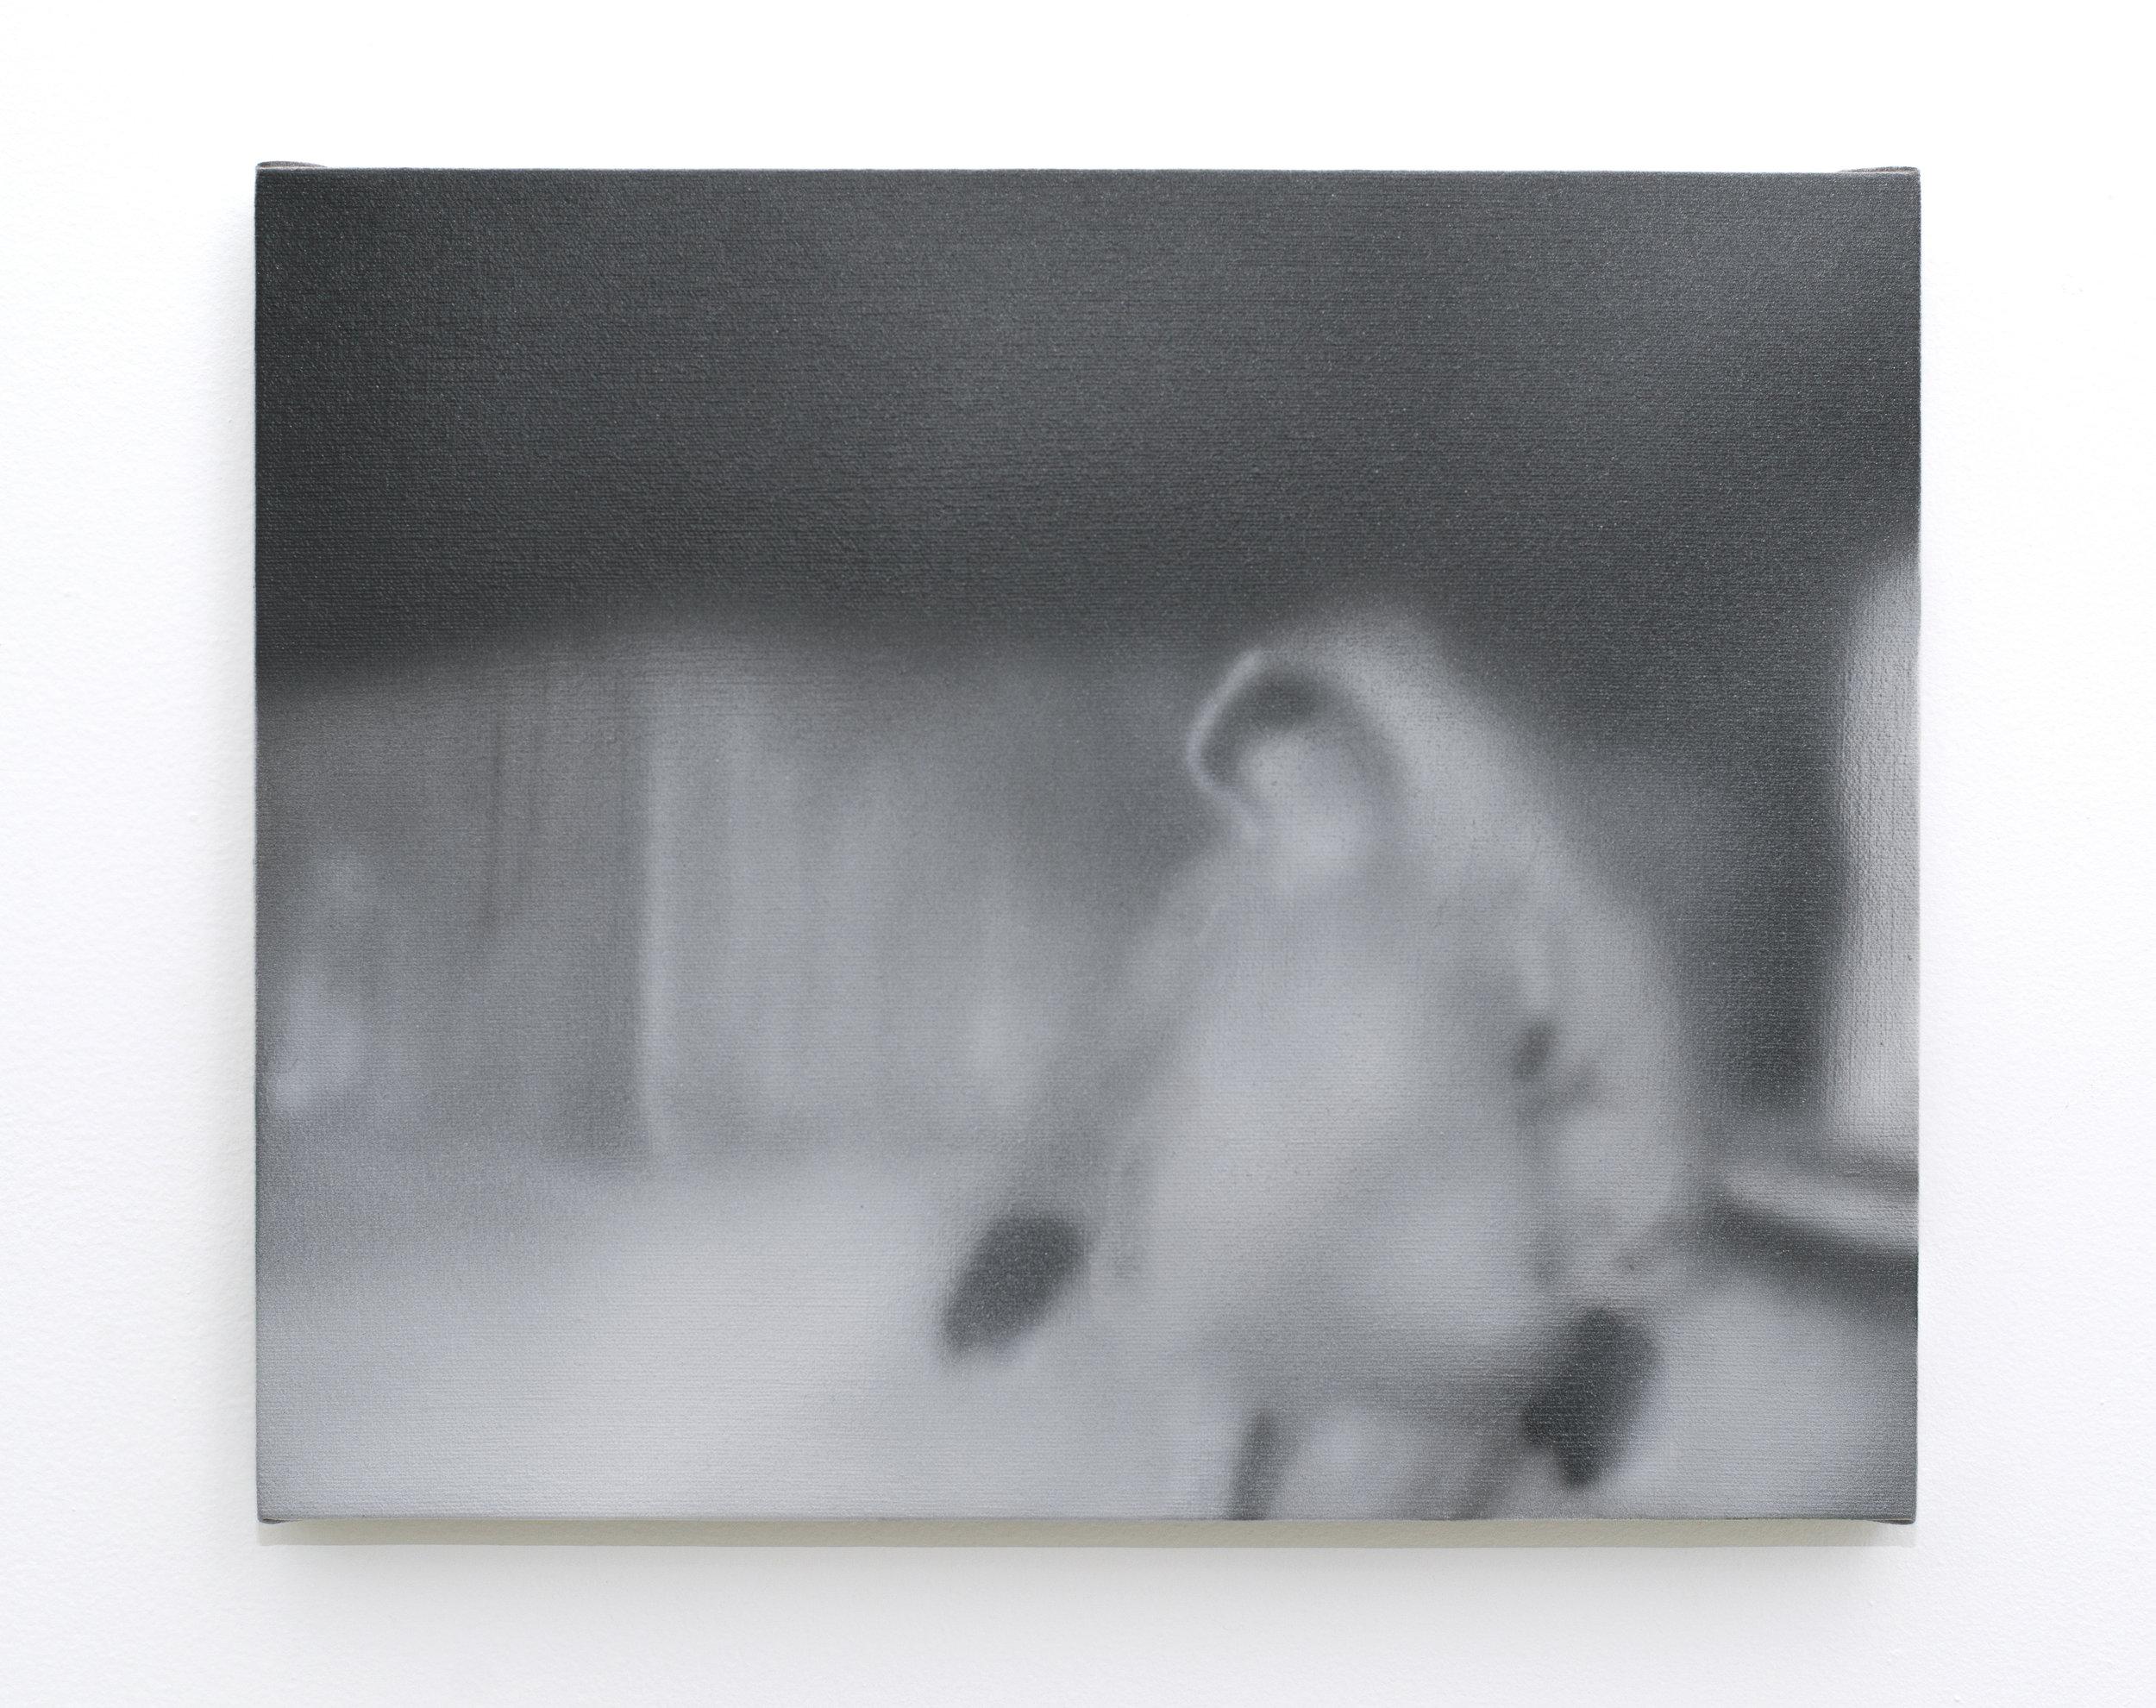 Ian Swanson   Untitled (ATM skimmer),  2016 Acrylic, gesso on linen